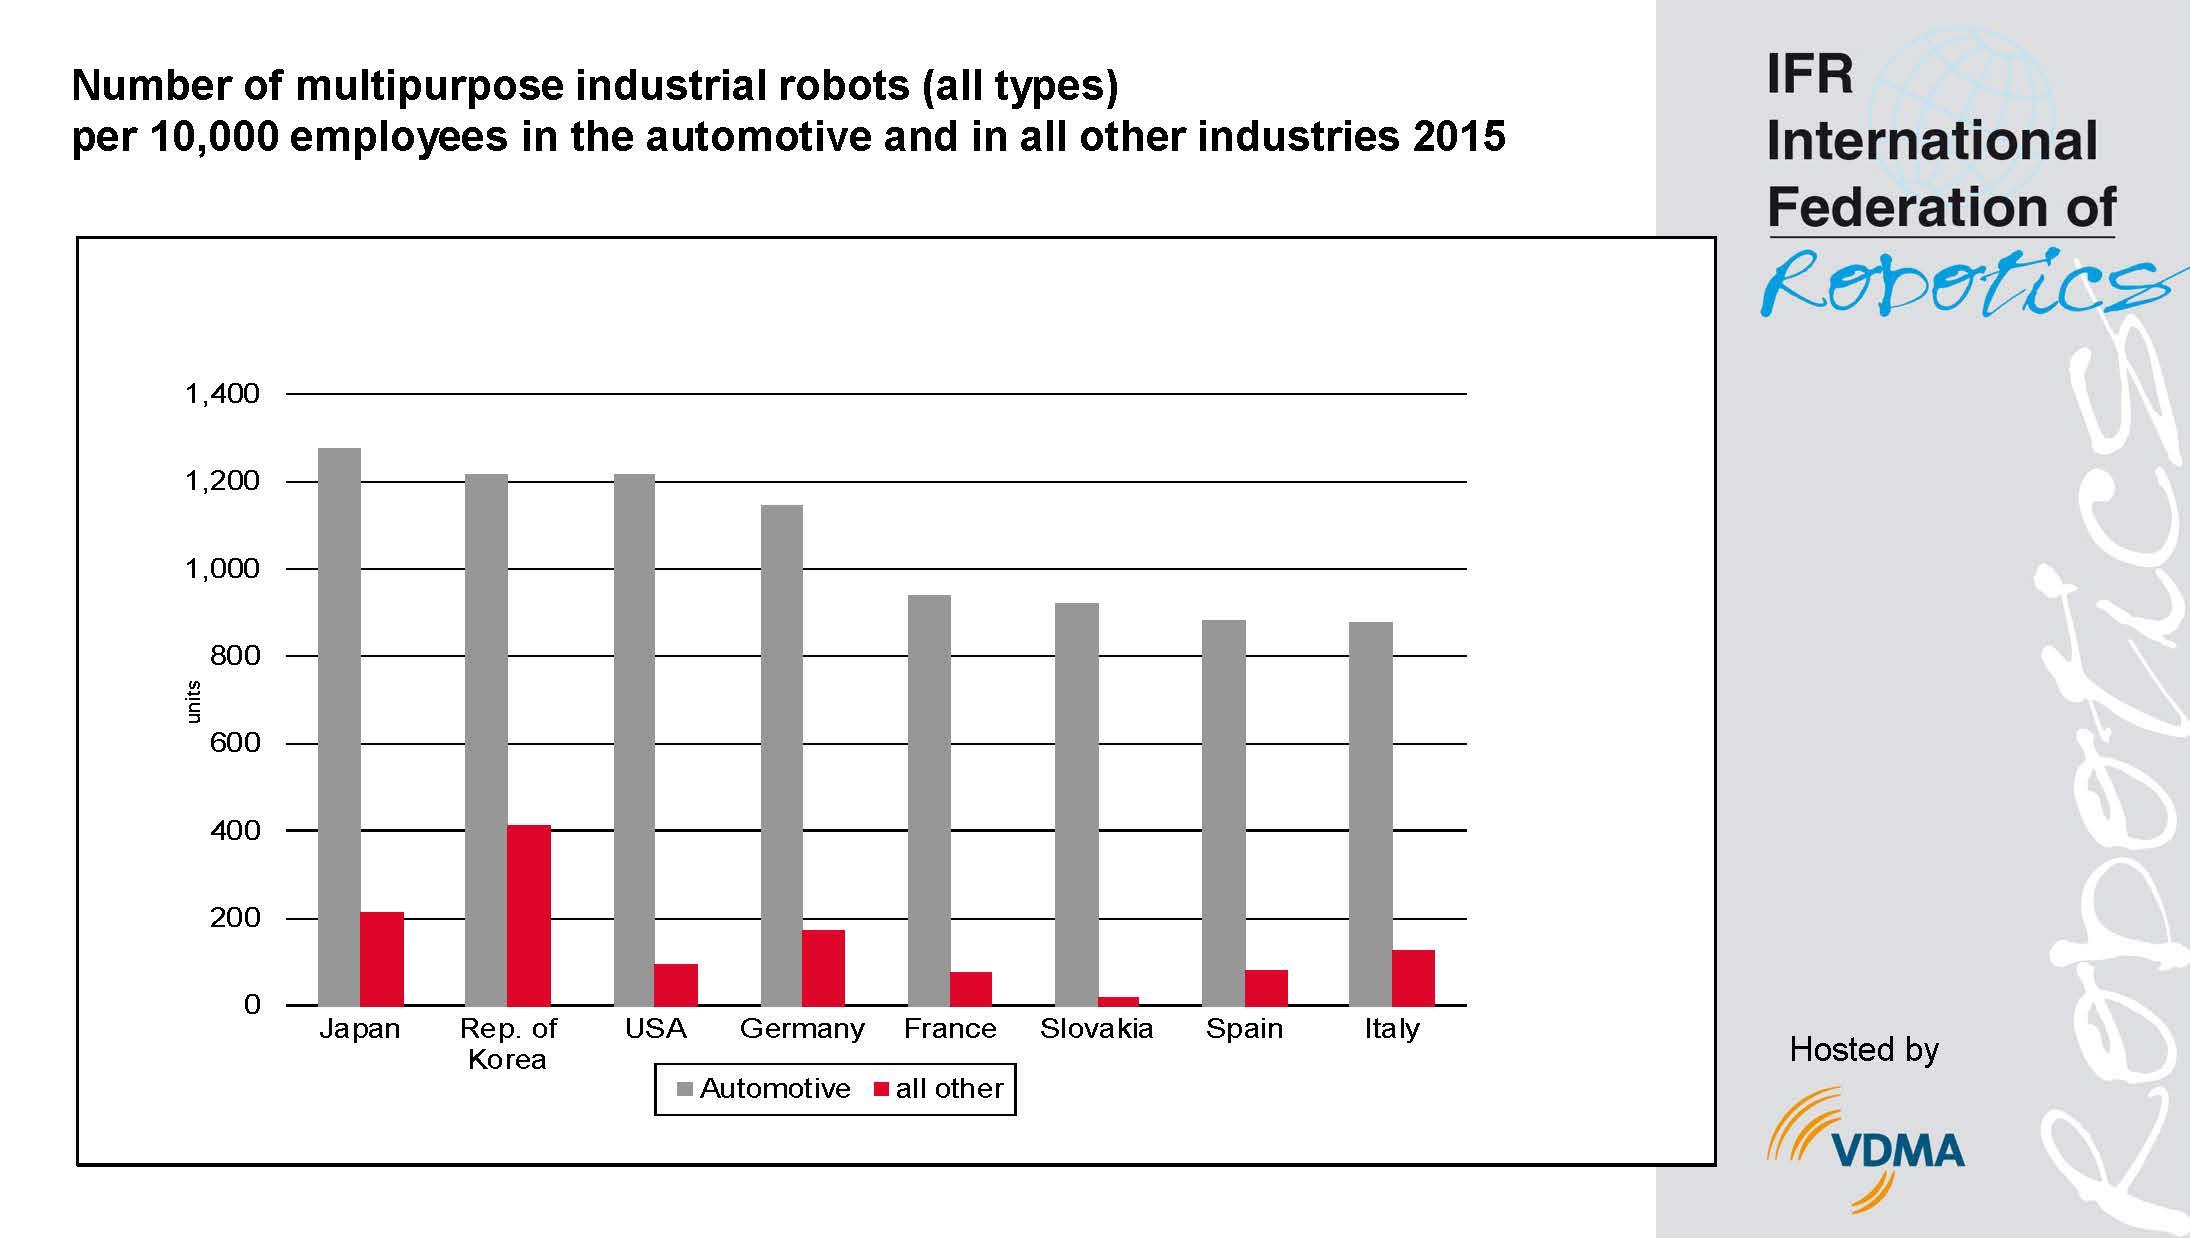 World Robotics Survey  - International Federation of Robotics 671f874b52ec4